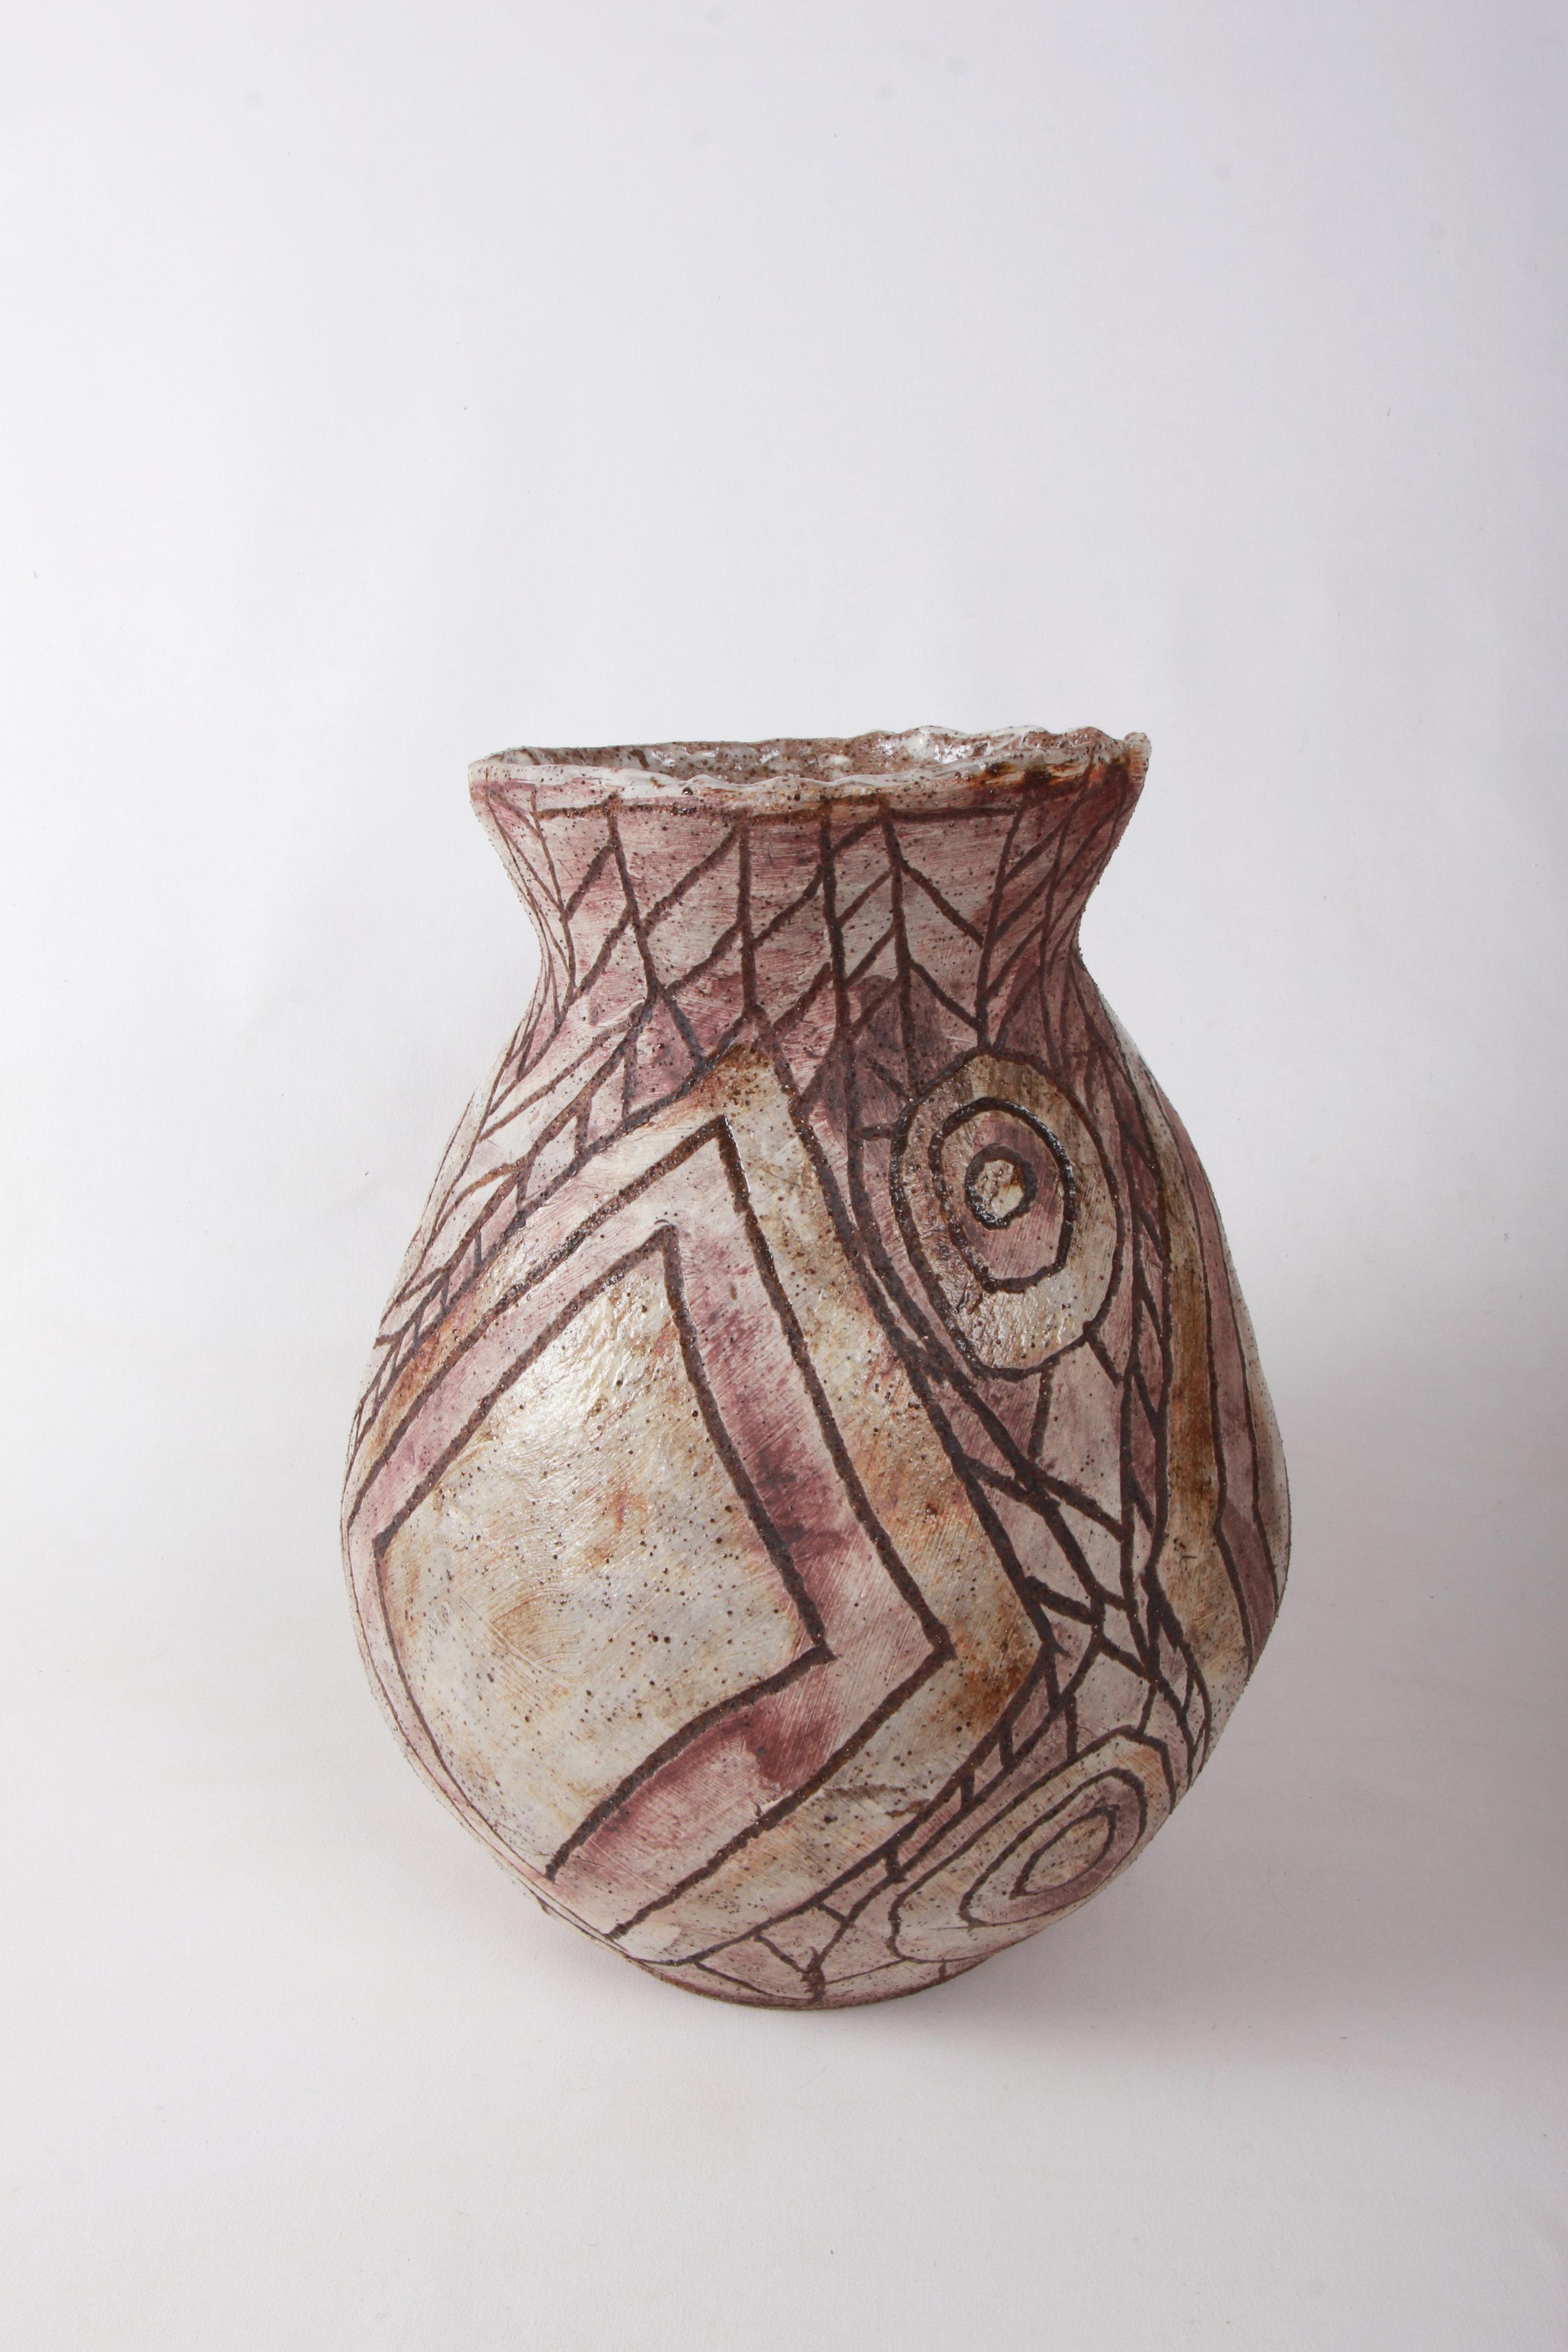 PEPAI JANGALA CARROLL  Walungurru, 2017   420H x 265mm Stoneware Catalog #920C-17   EMAIL INQUIRY